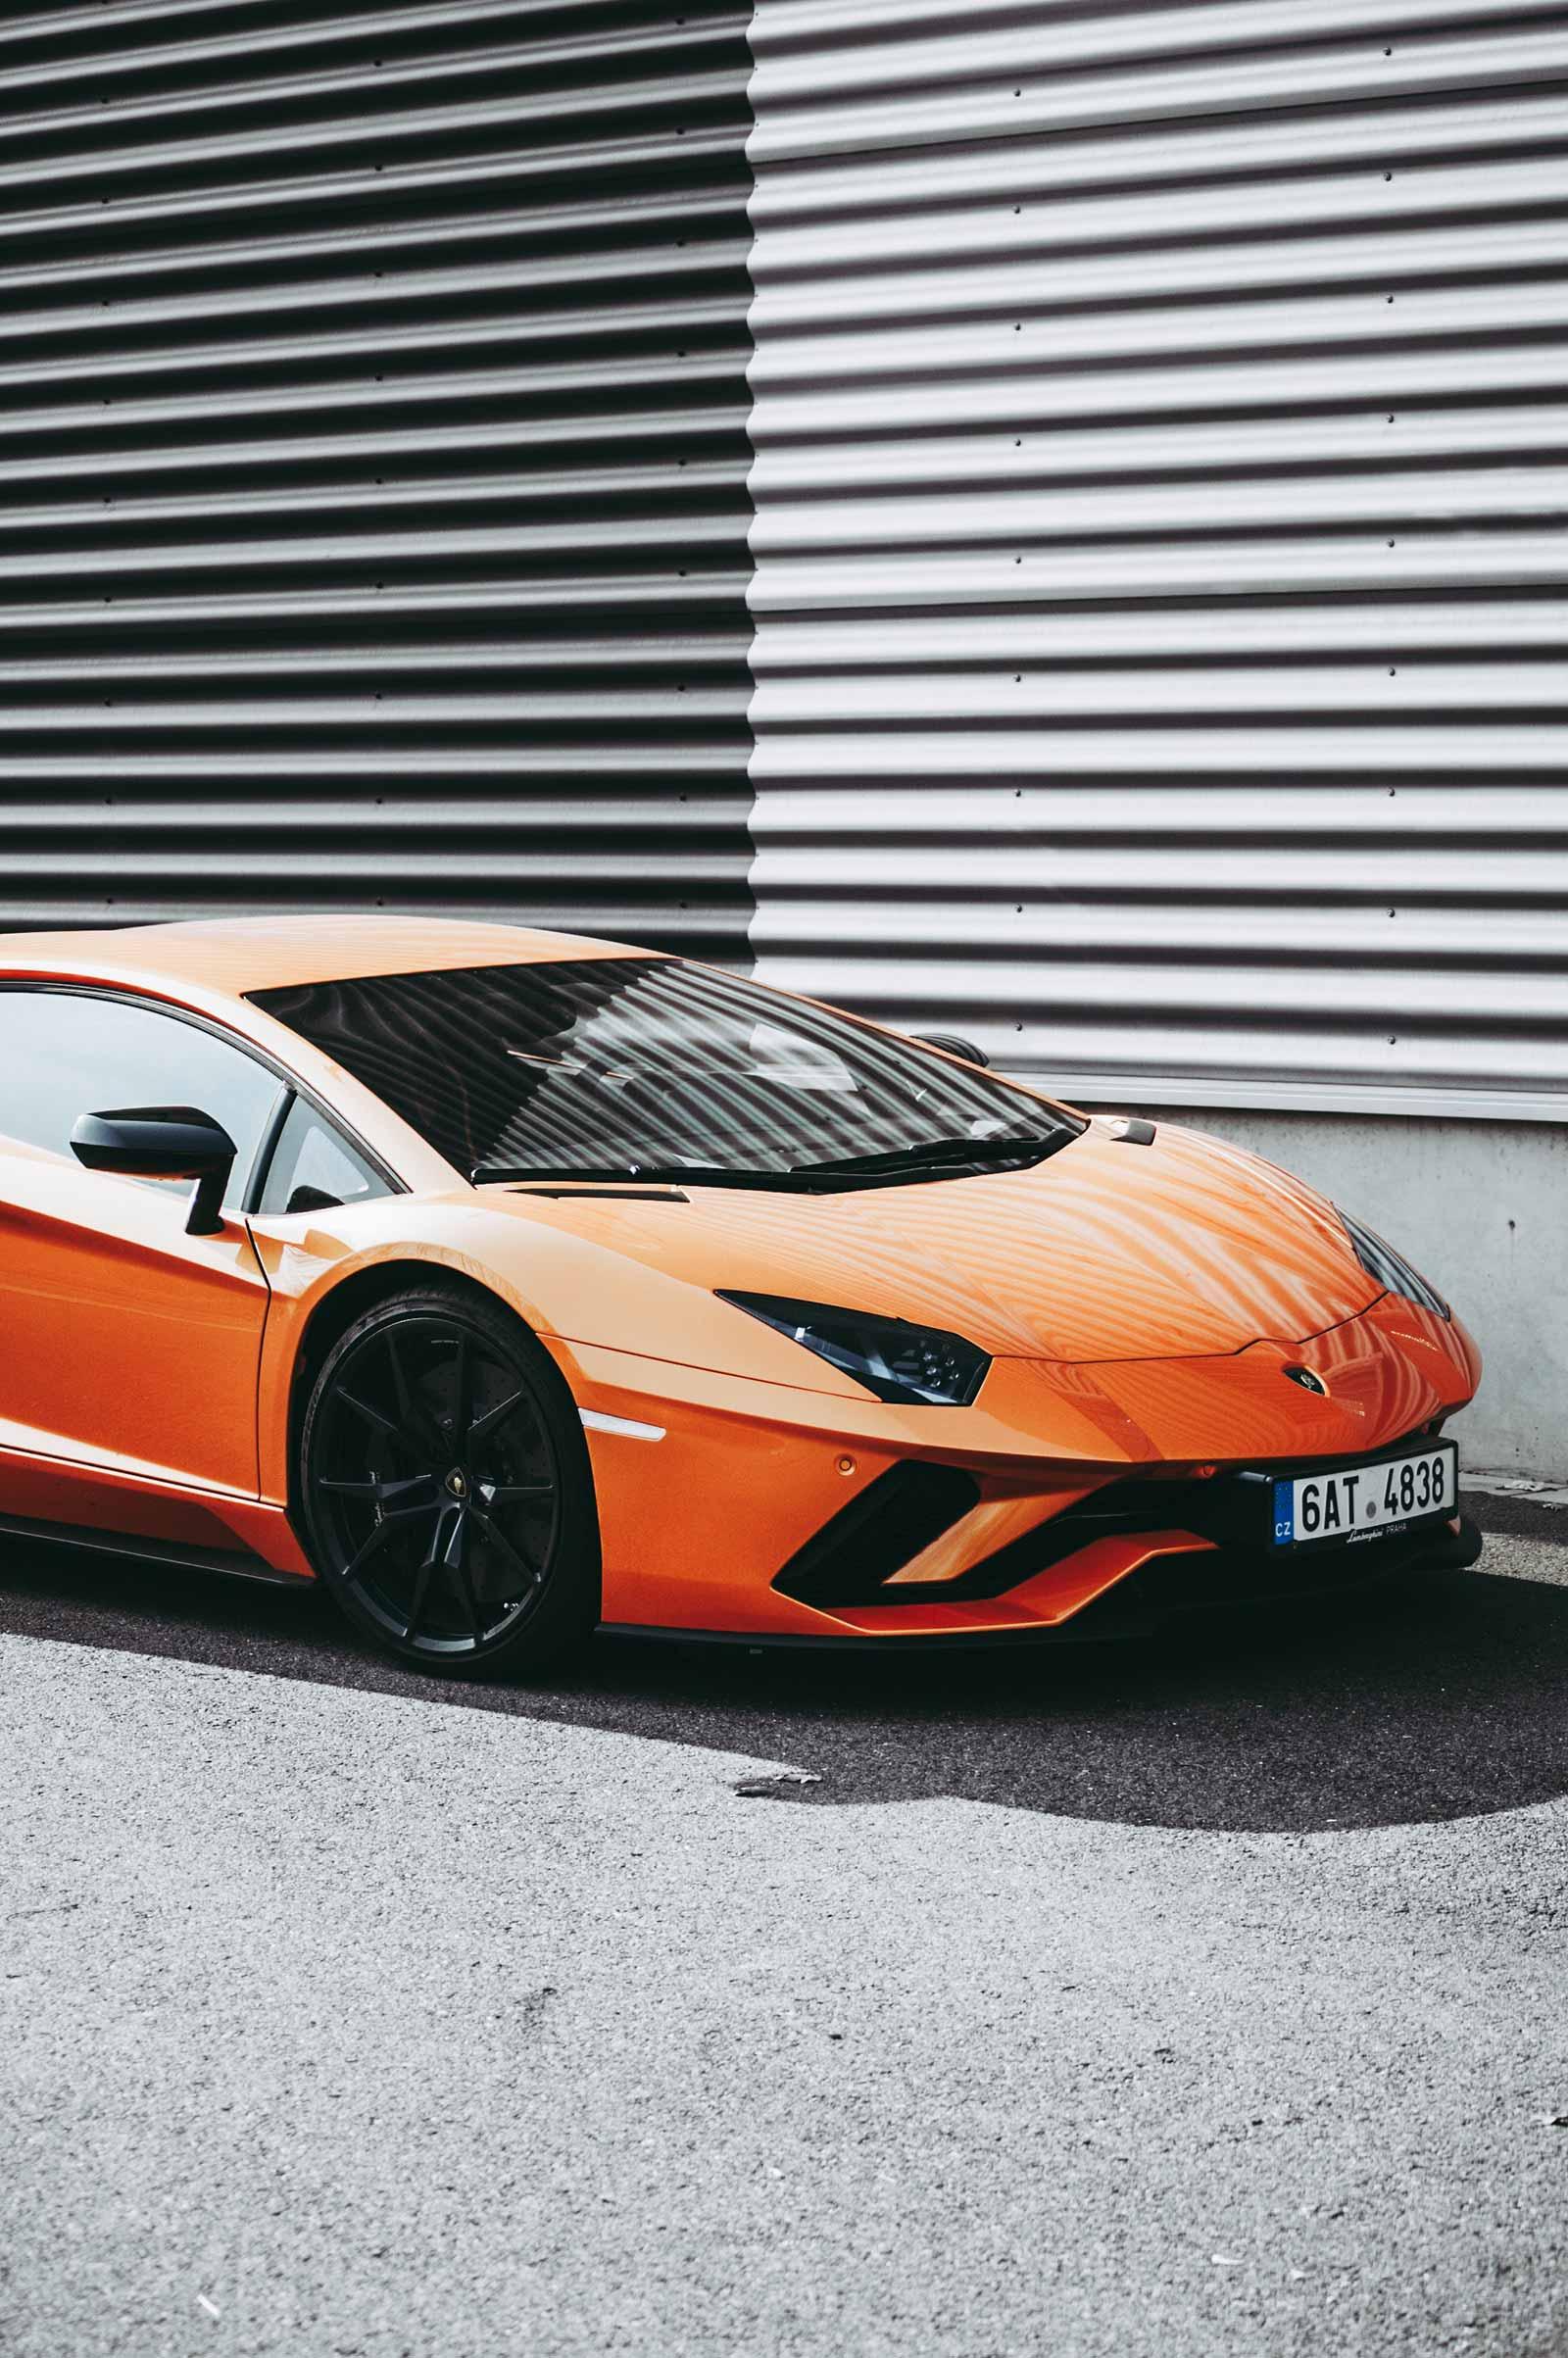 Luxus-Sportwagen-Mallorca-Sportwagen-mieten-Mallorca-1